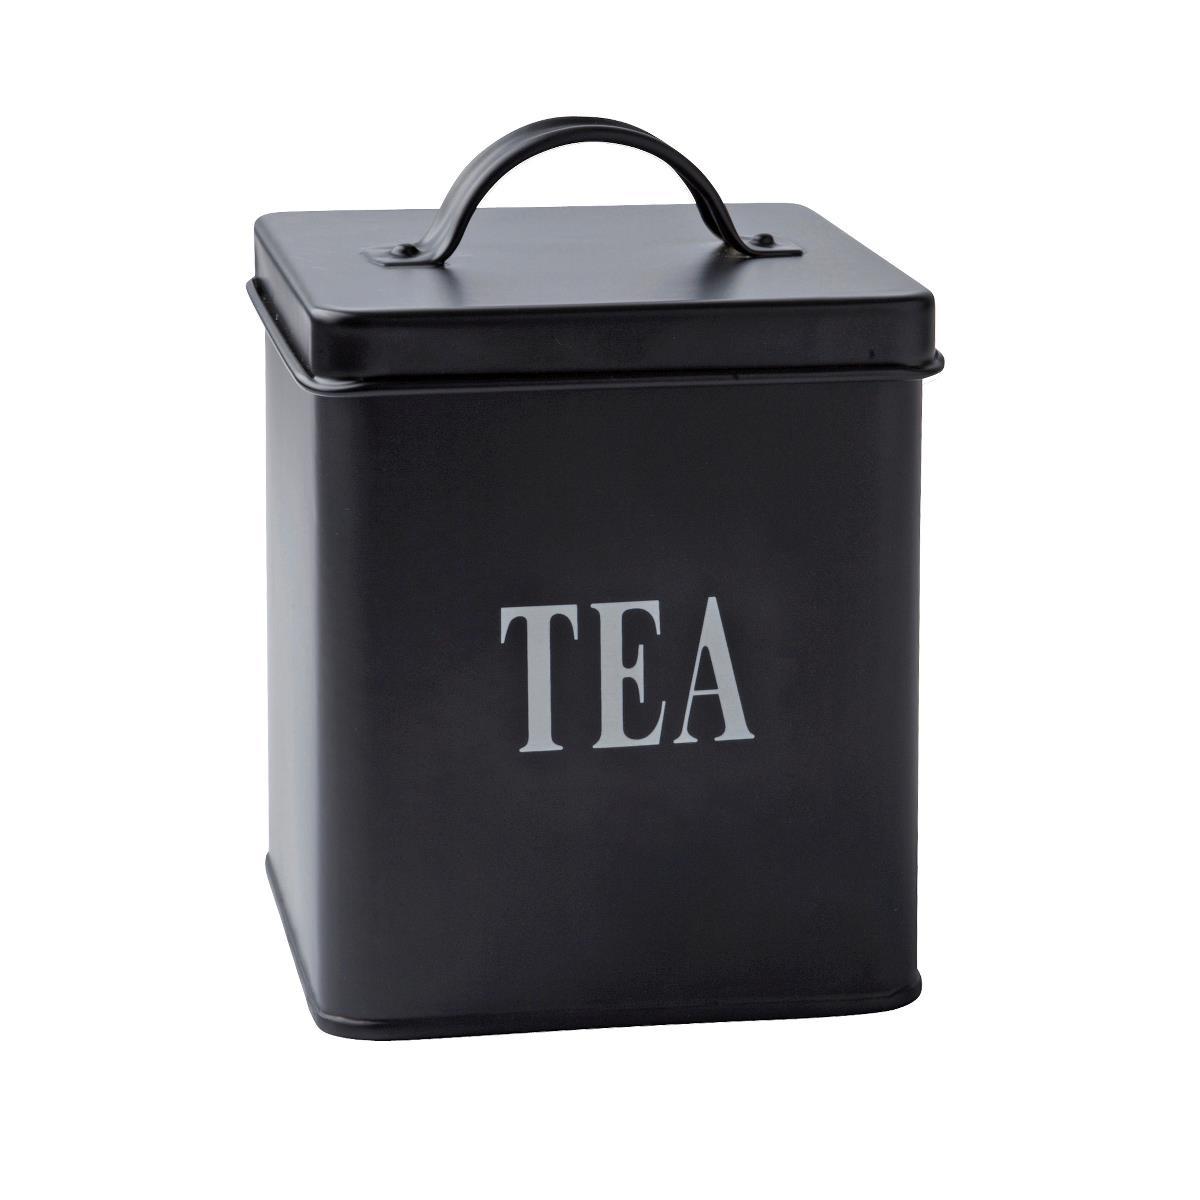 Cutie metalica Tea Black 15 L KJ 232112